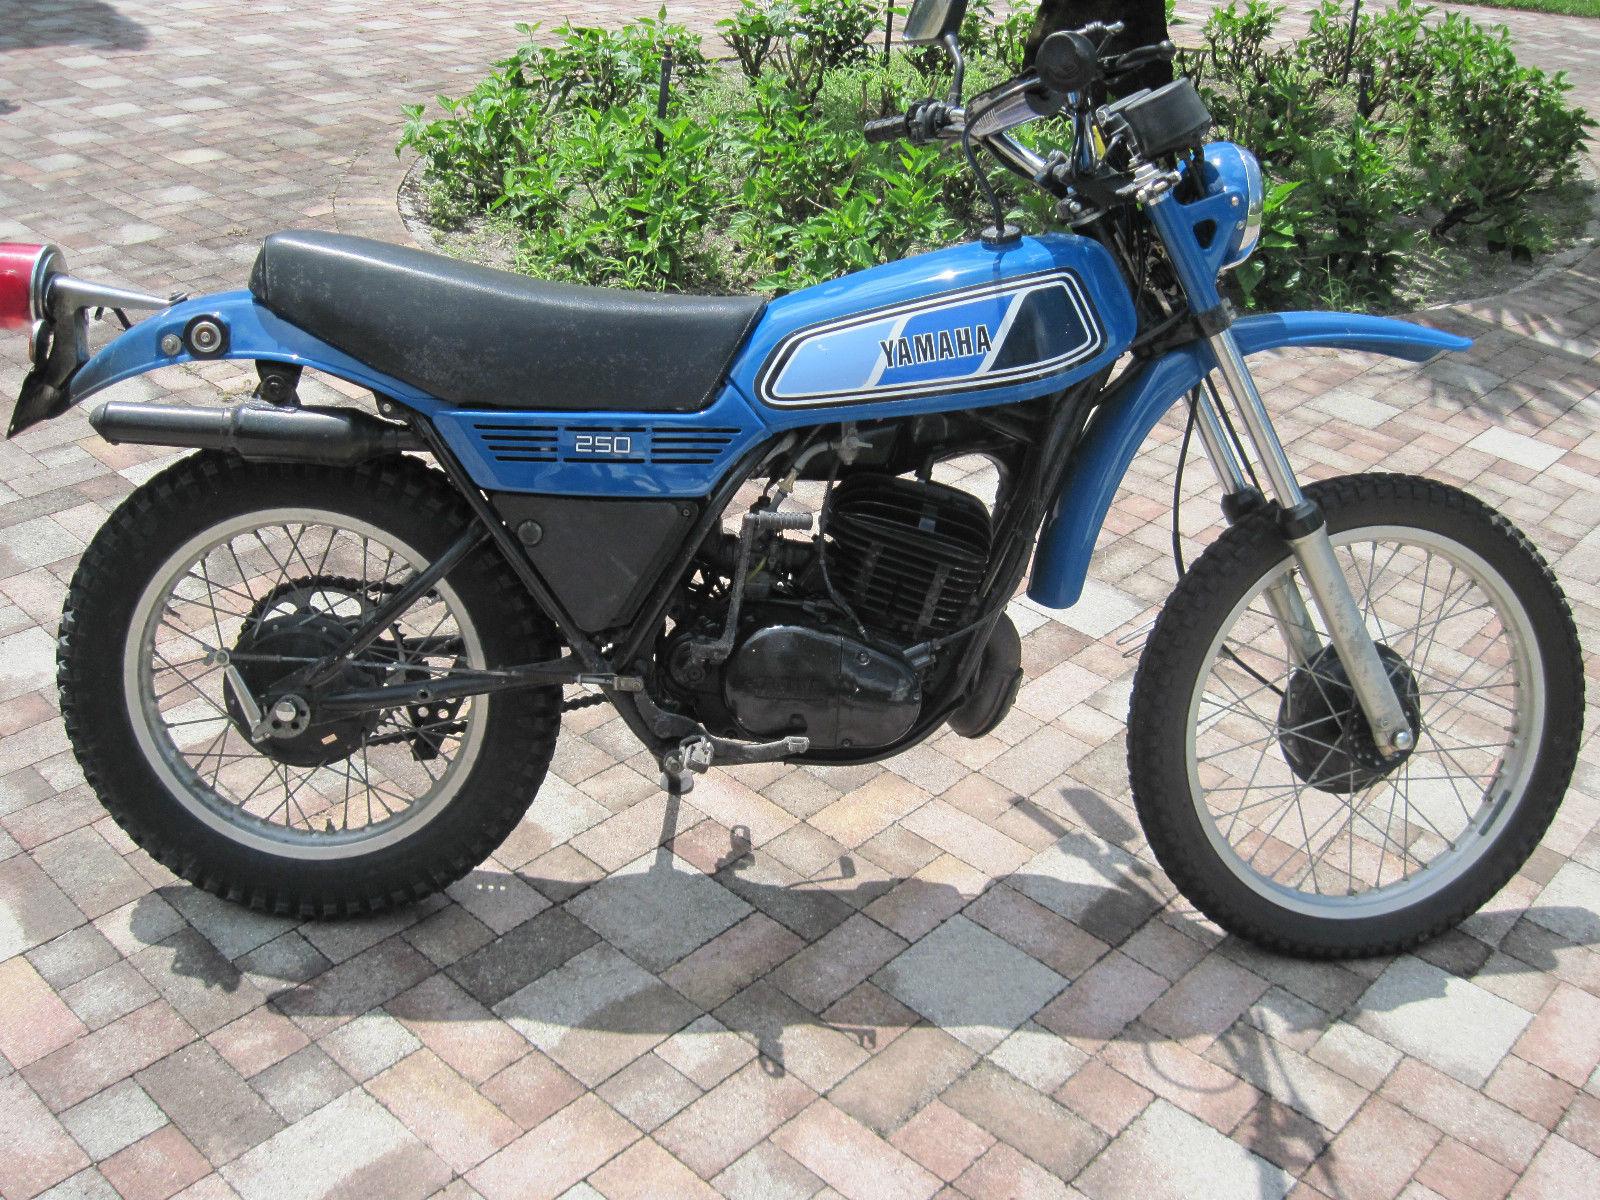 1977 yamaha dt 250 for Yamaha dt 250 for sale